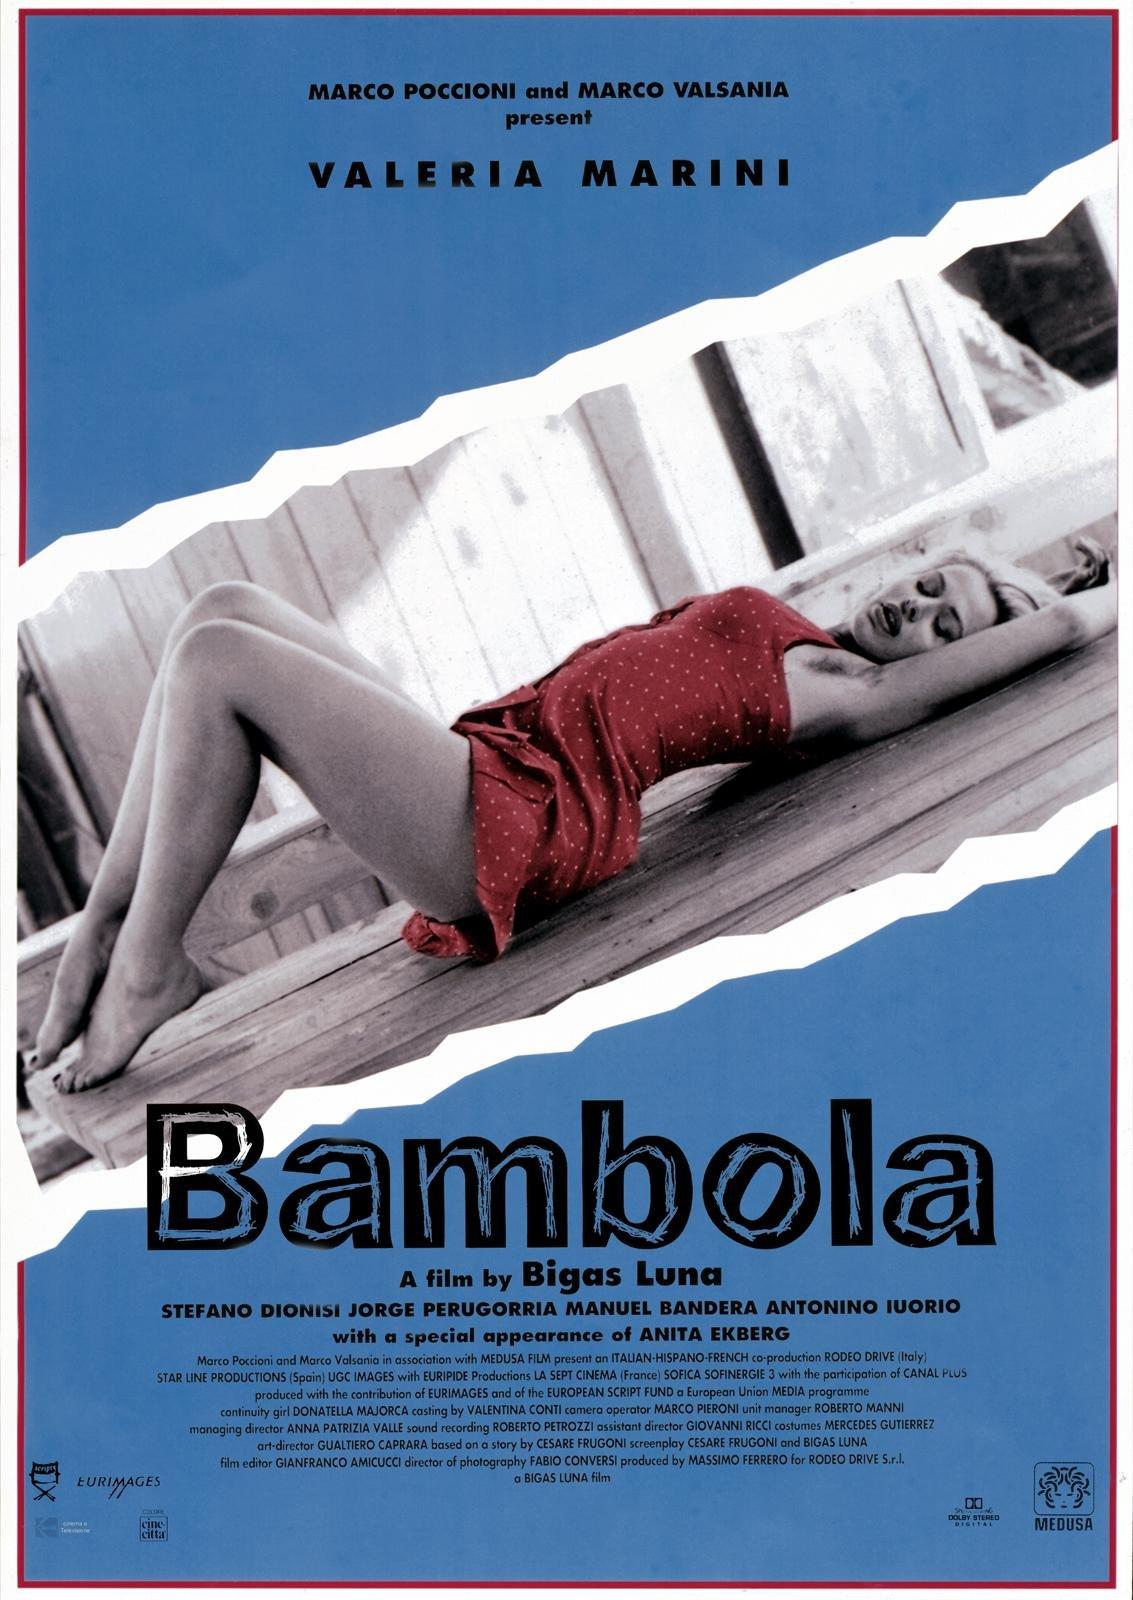 FILM BAMBOLA 1996 TÉLÉCHARGER